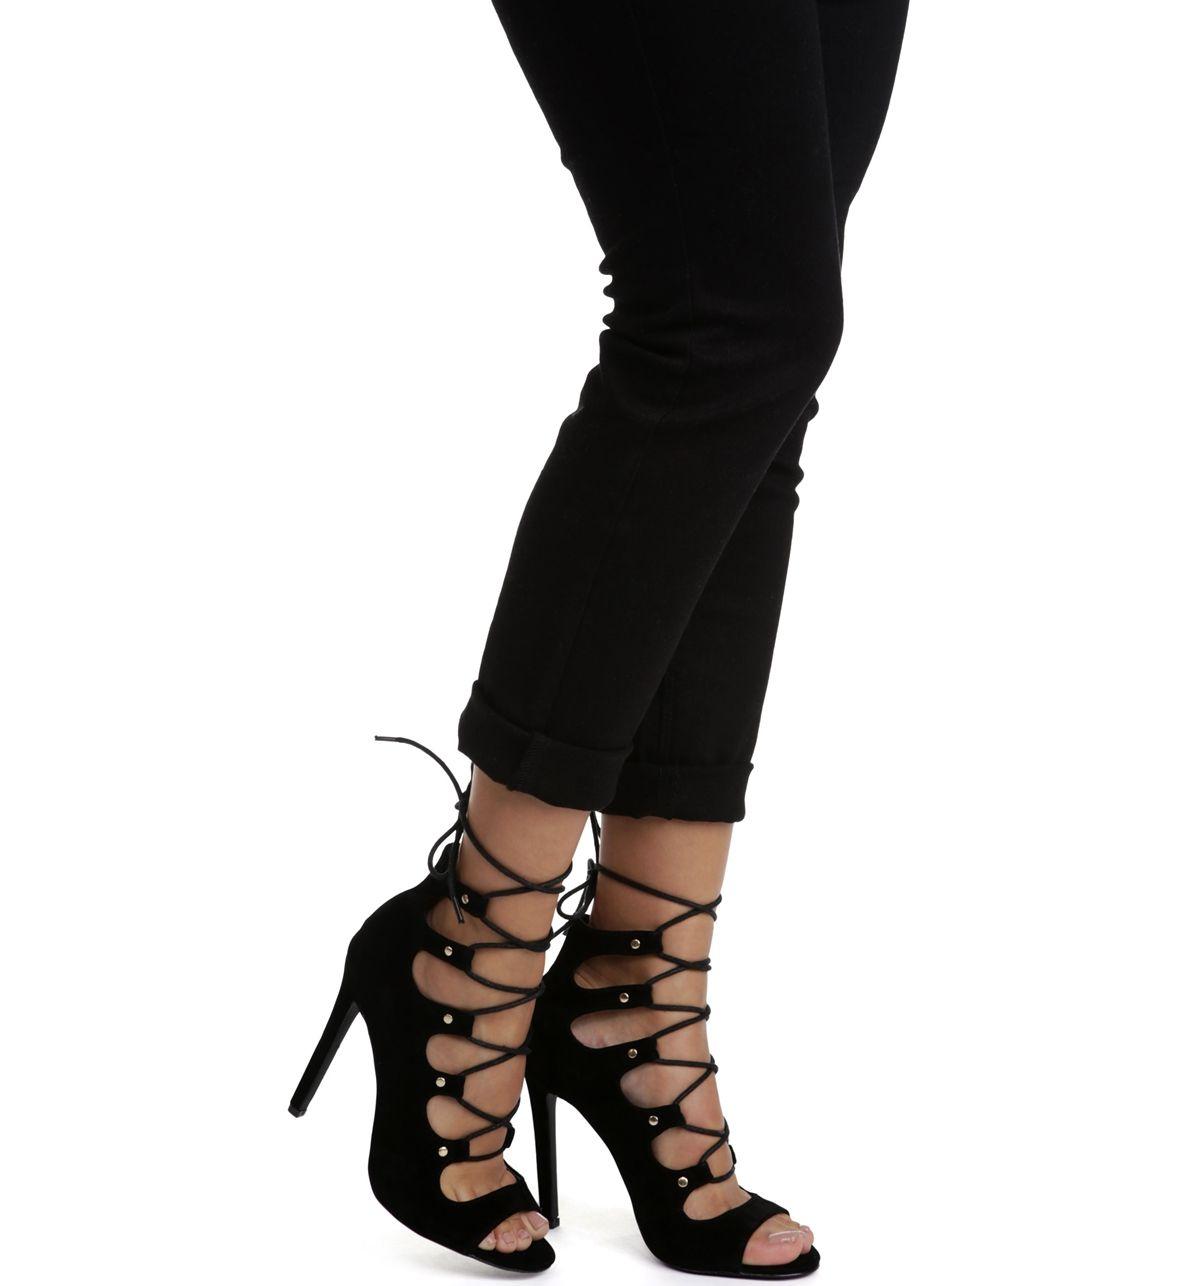 Black Miss Gladiator Stiletto Heel